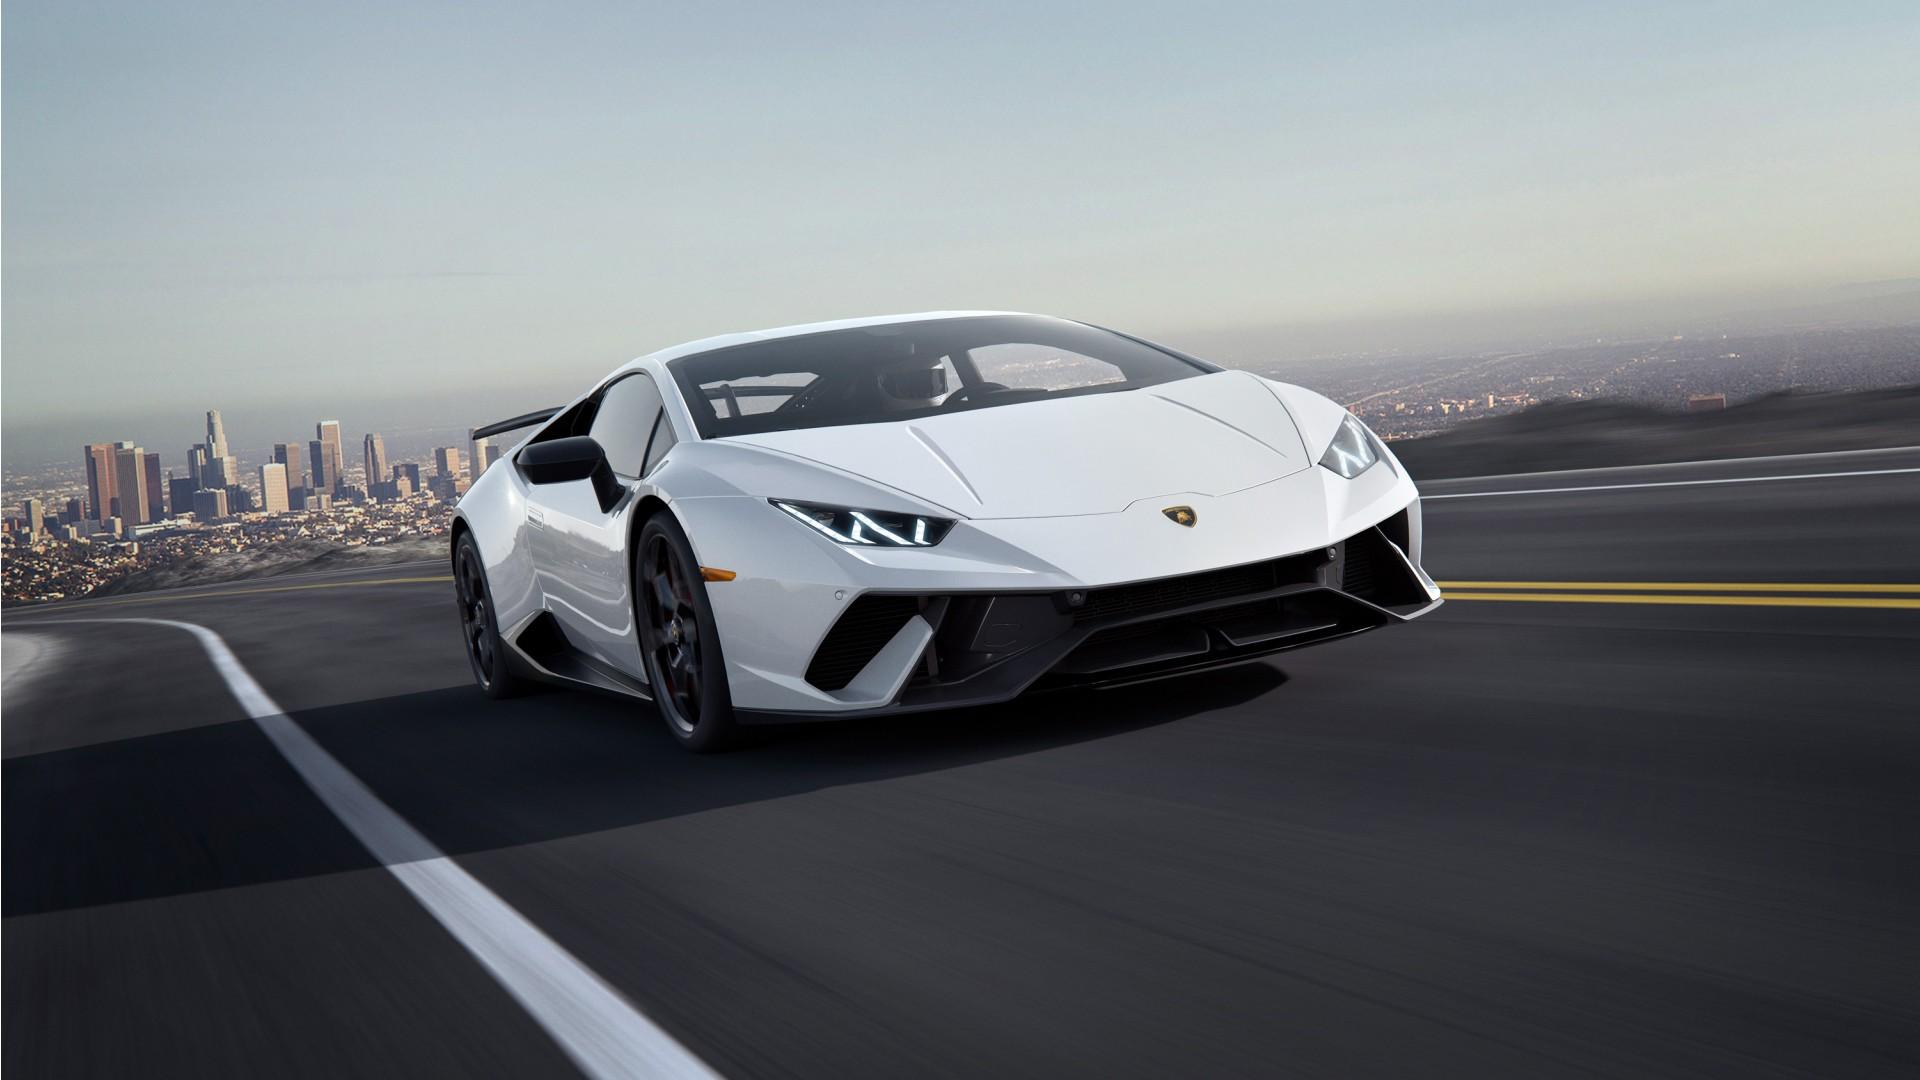 Lamborghini Huracan 2018 Wallpaper   HD Car Wallpapers ...